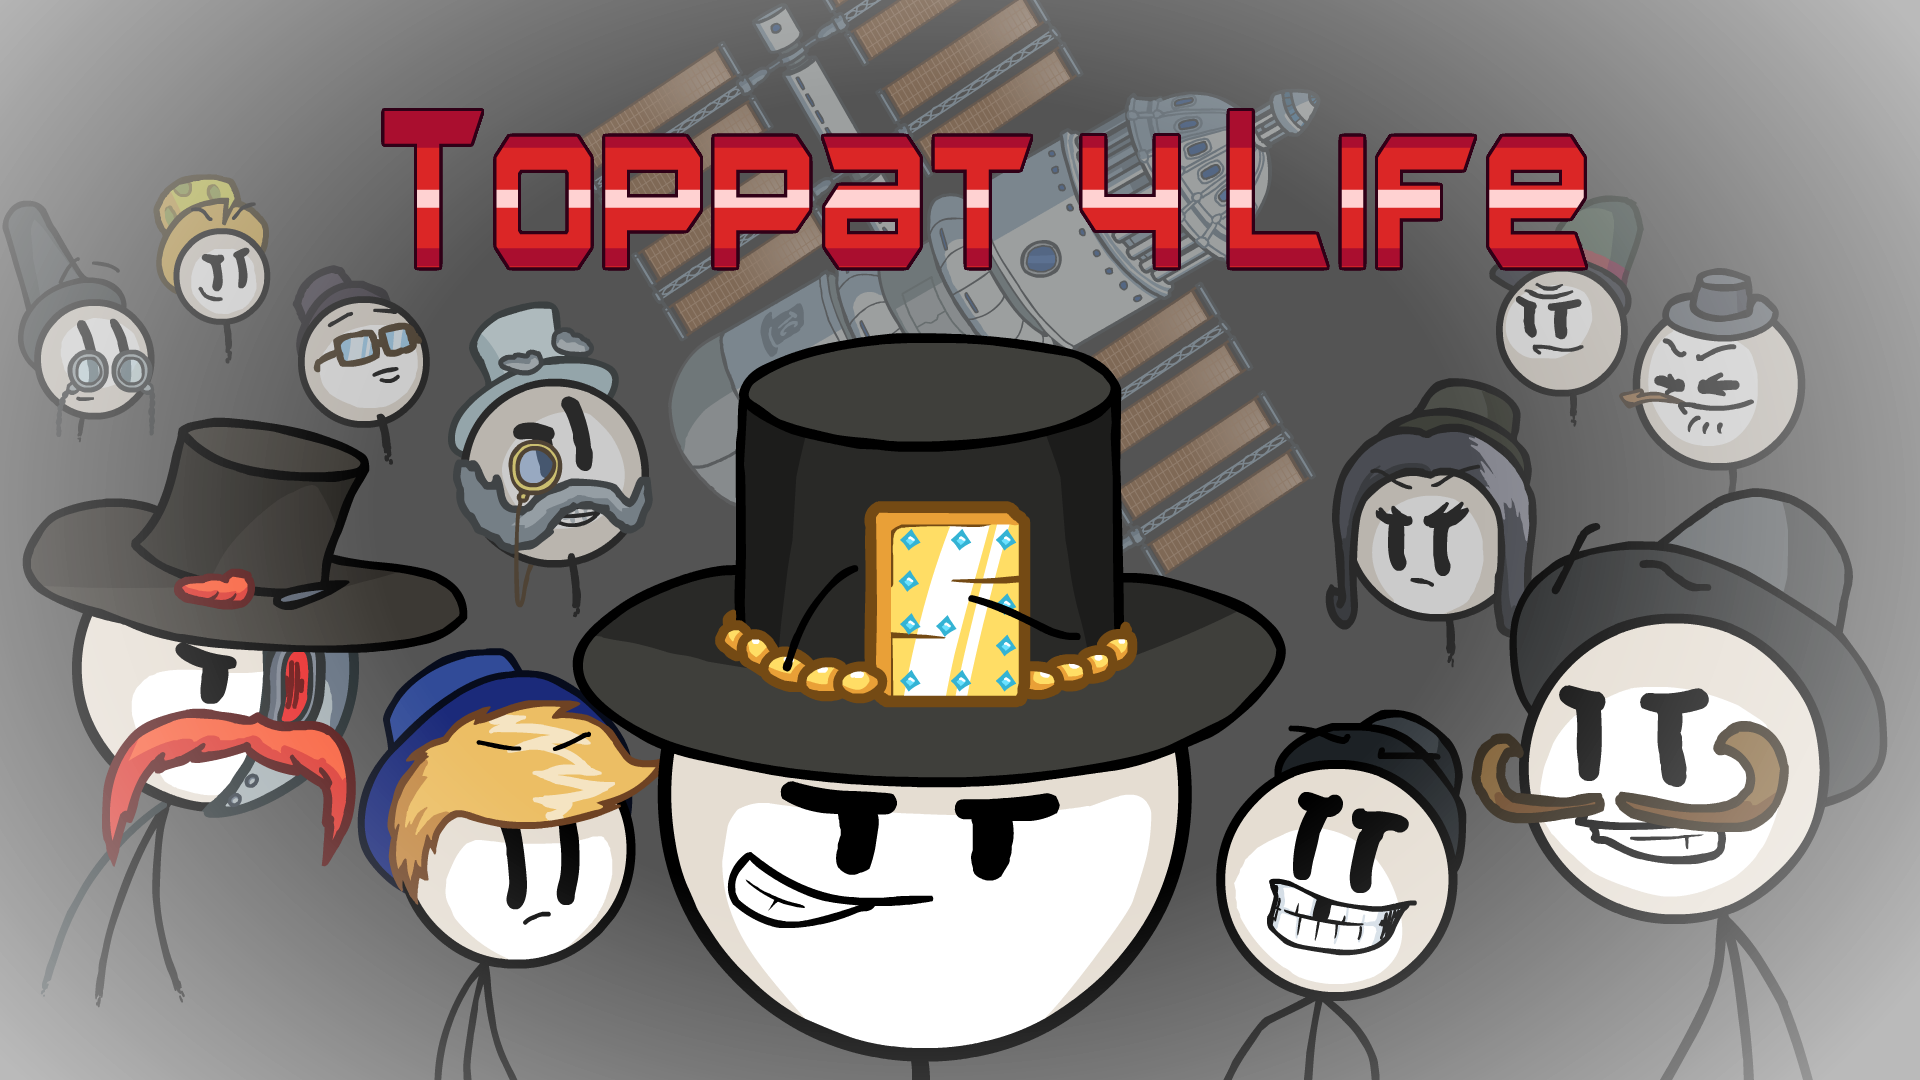 Toppat 4 Life